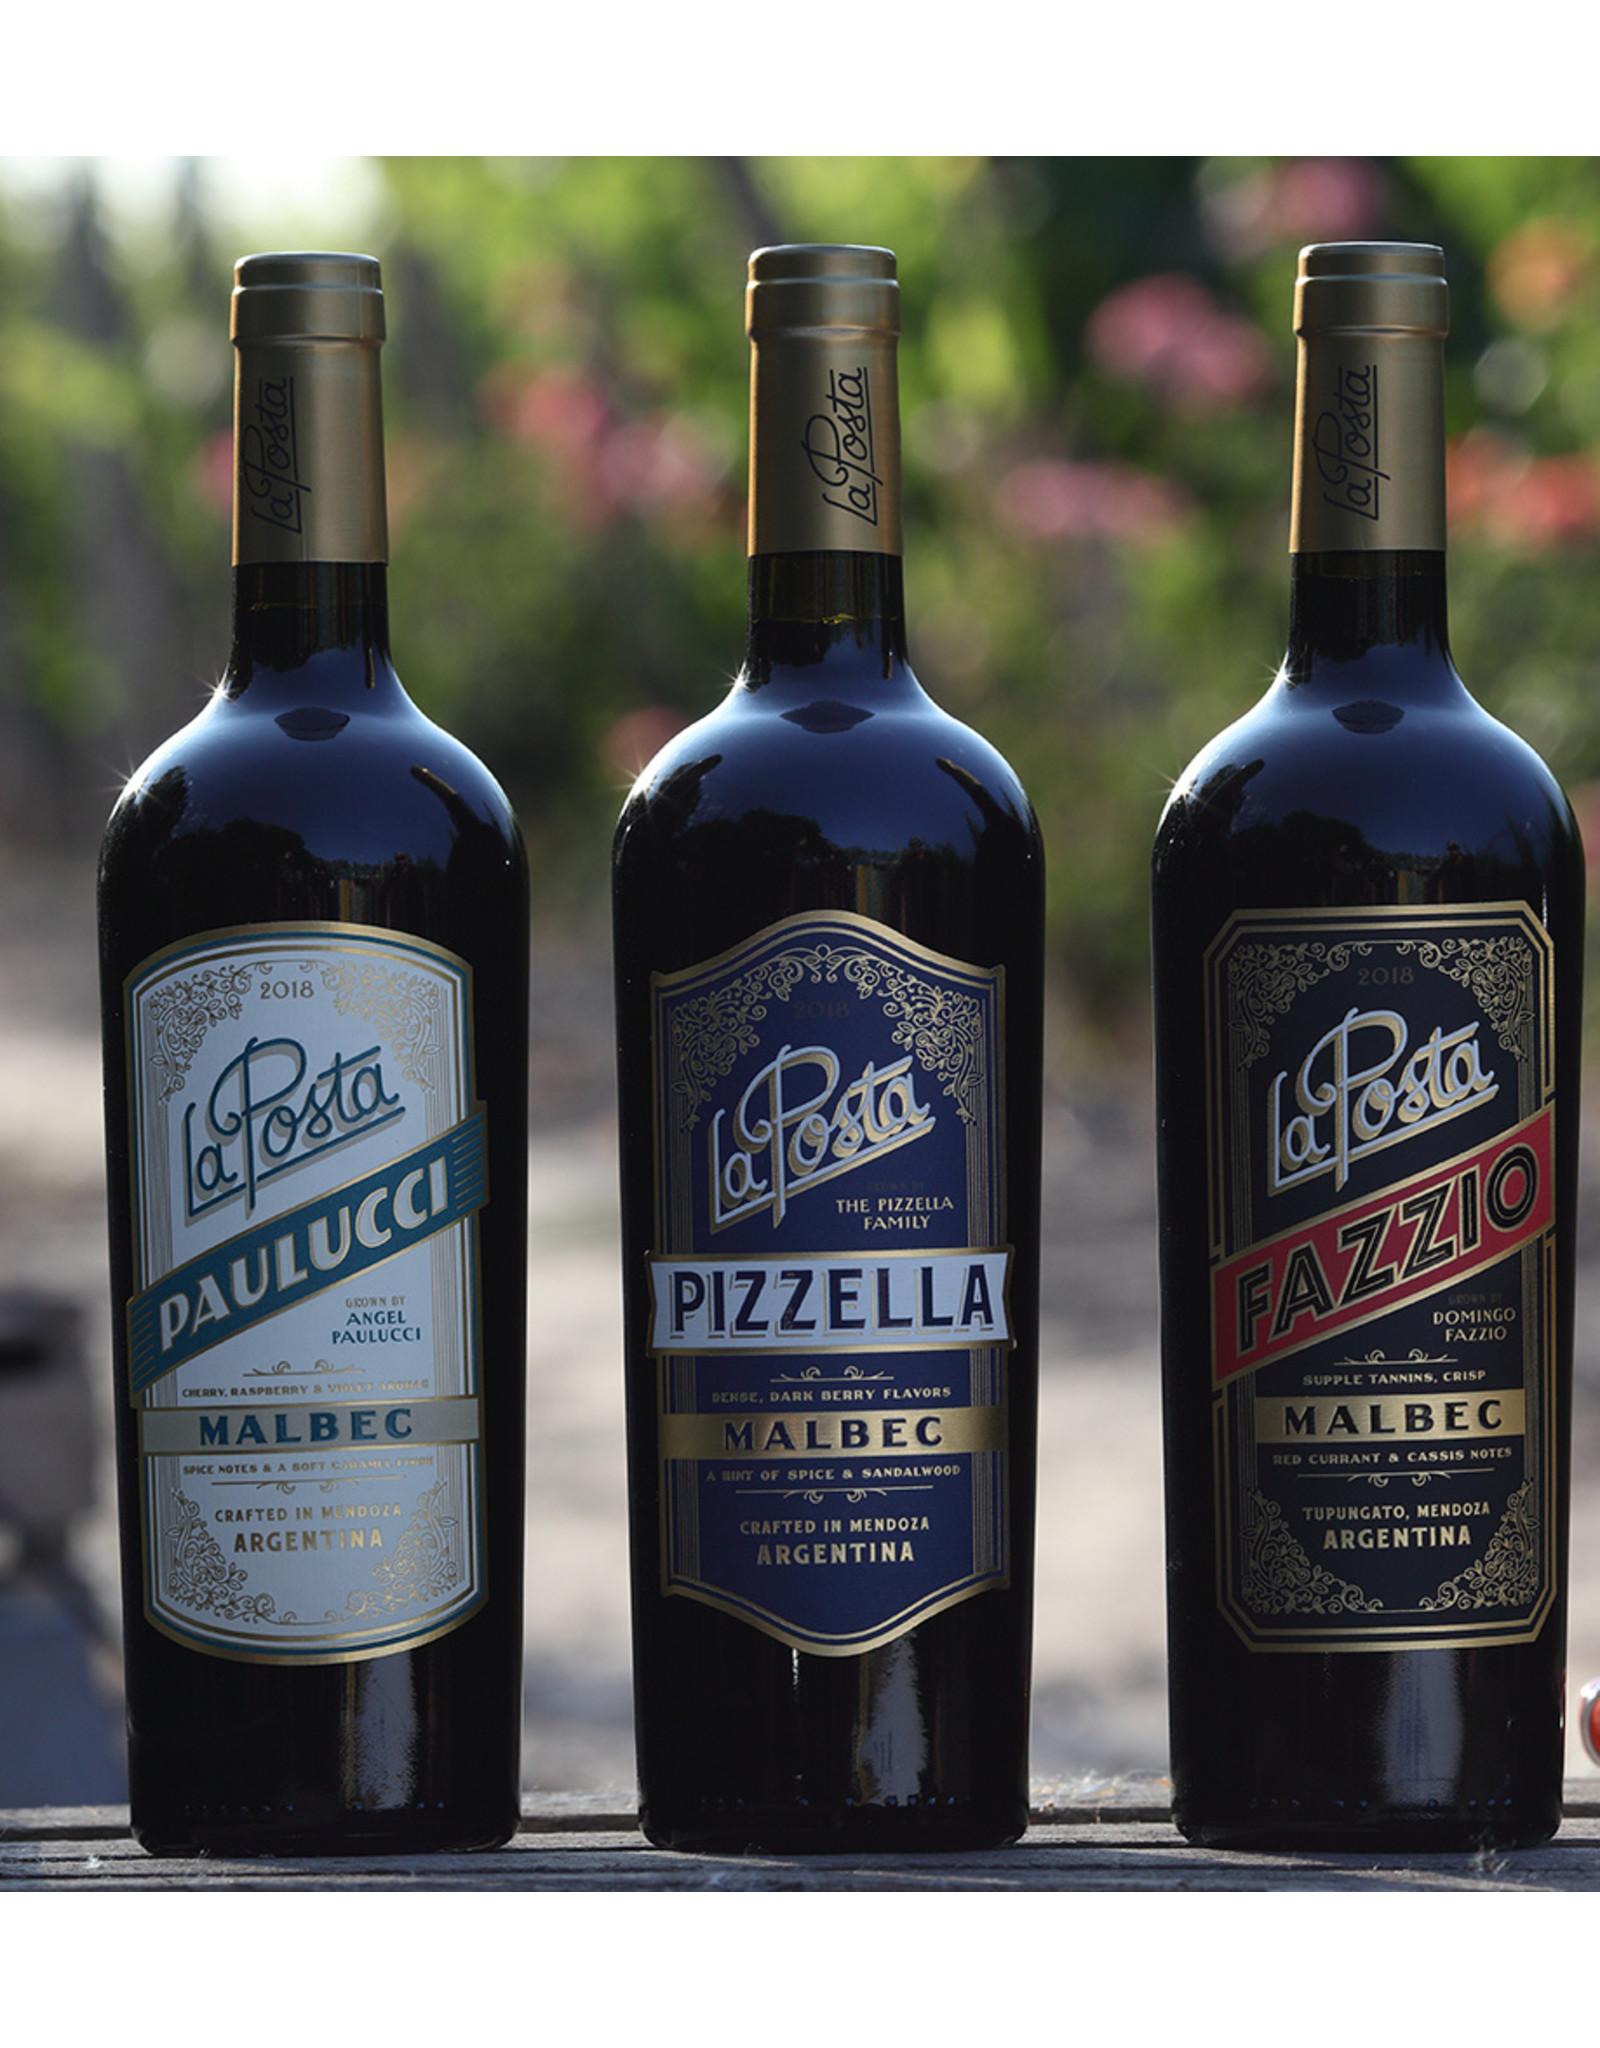 La Posta Wines 3-pack